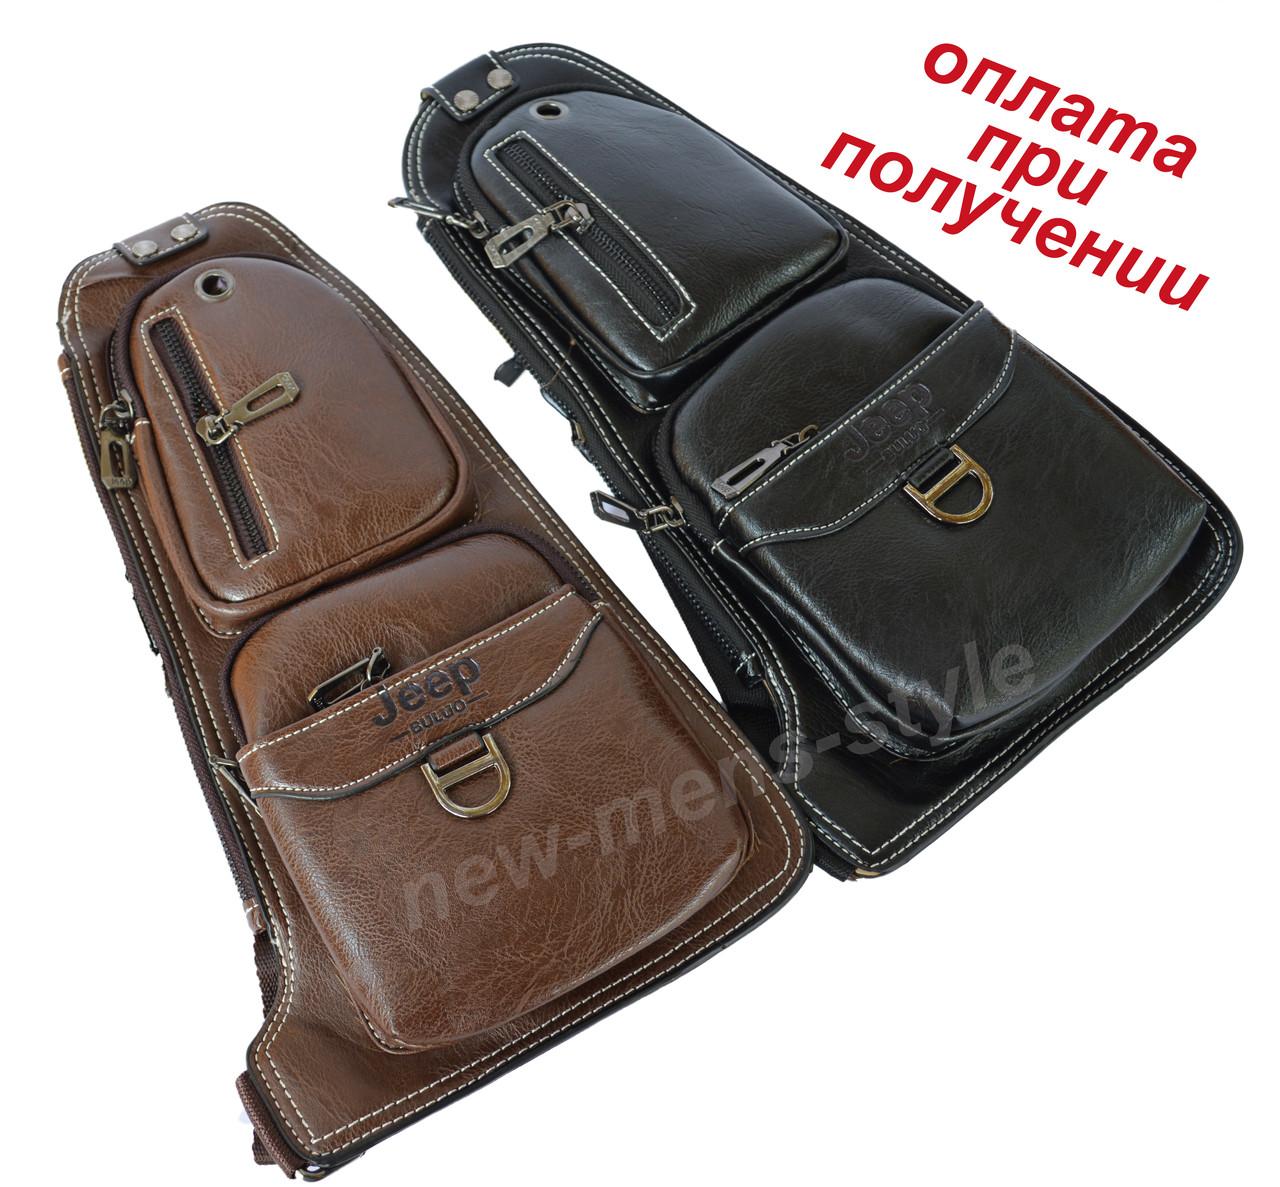 7755111eb11e Мужская спортивная кожаная сумка слинг рюкзак бананка кобура Jeep -